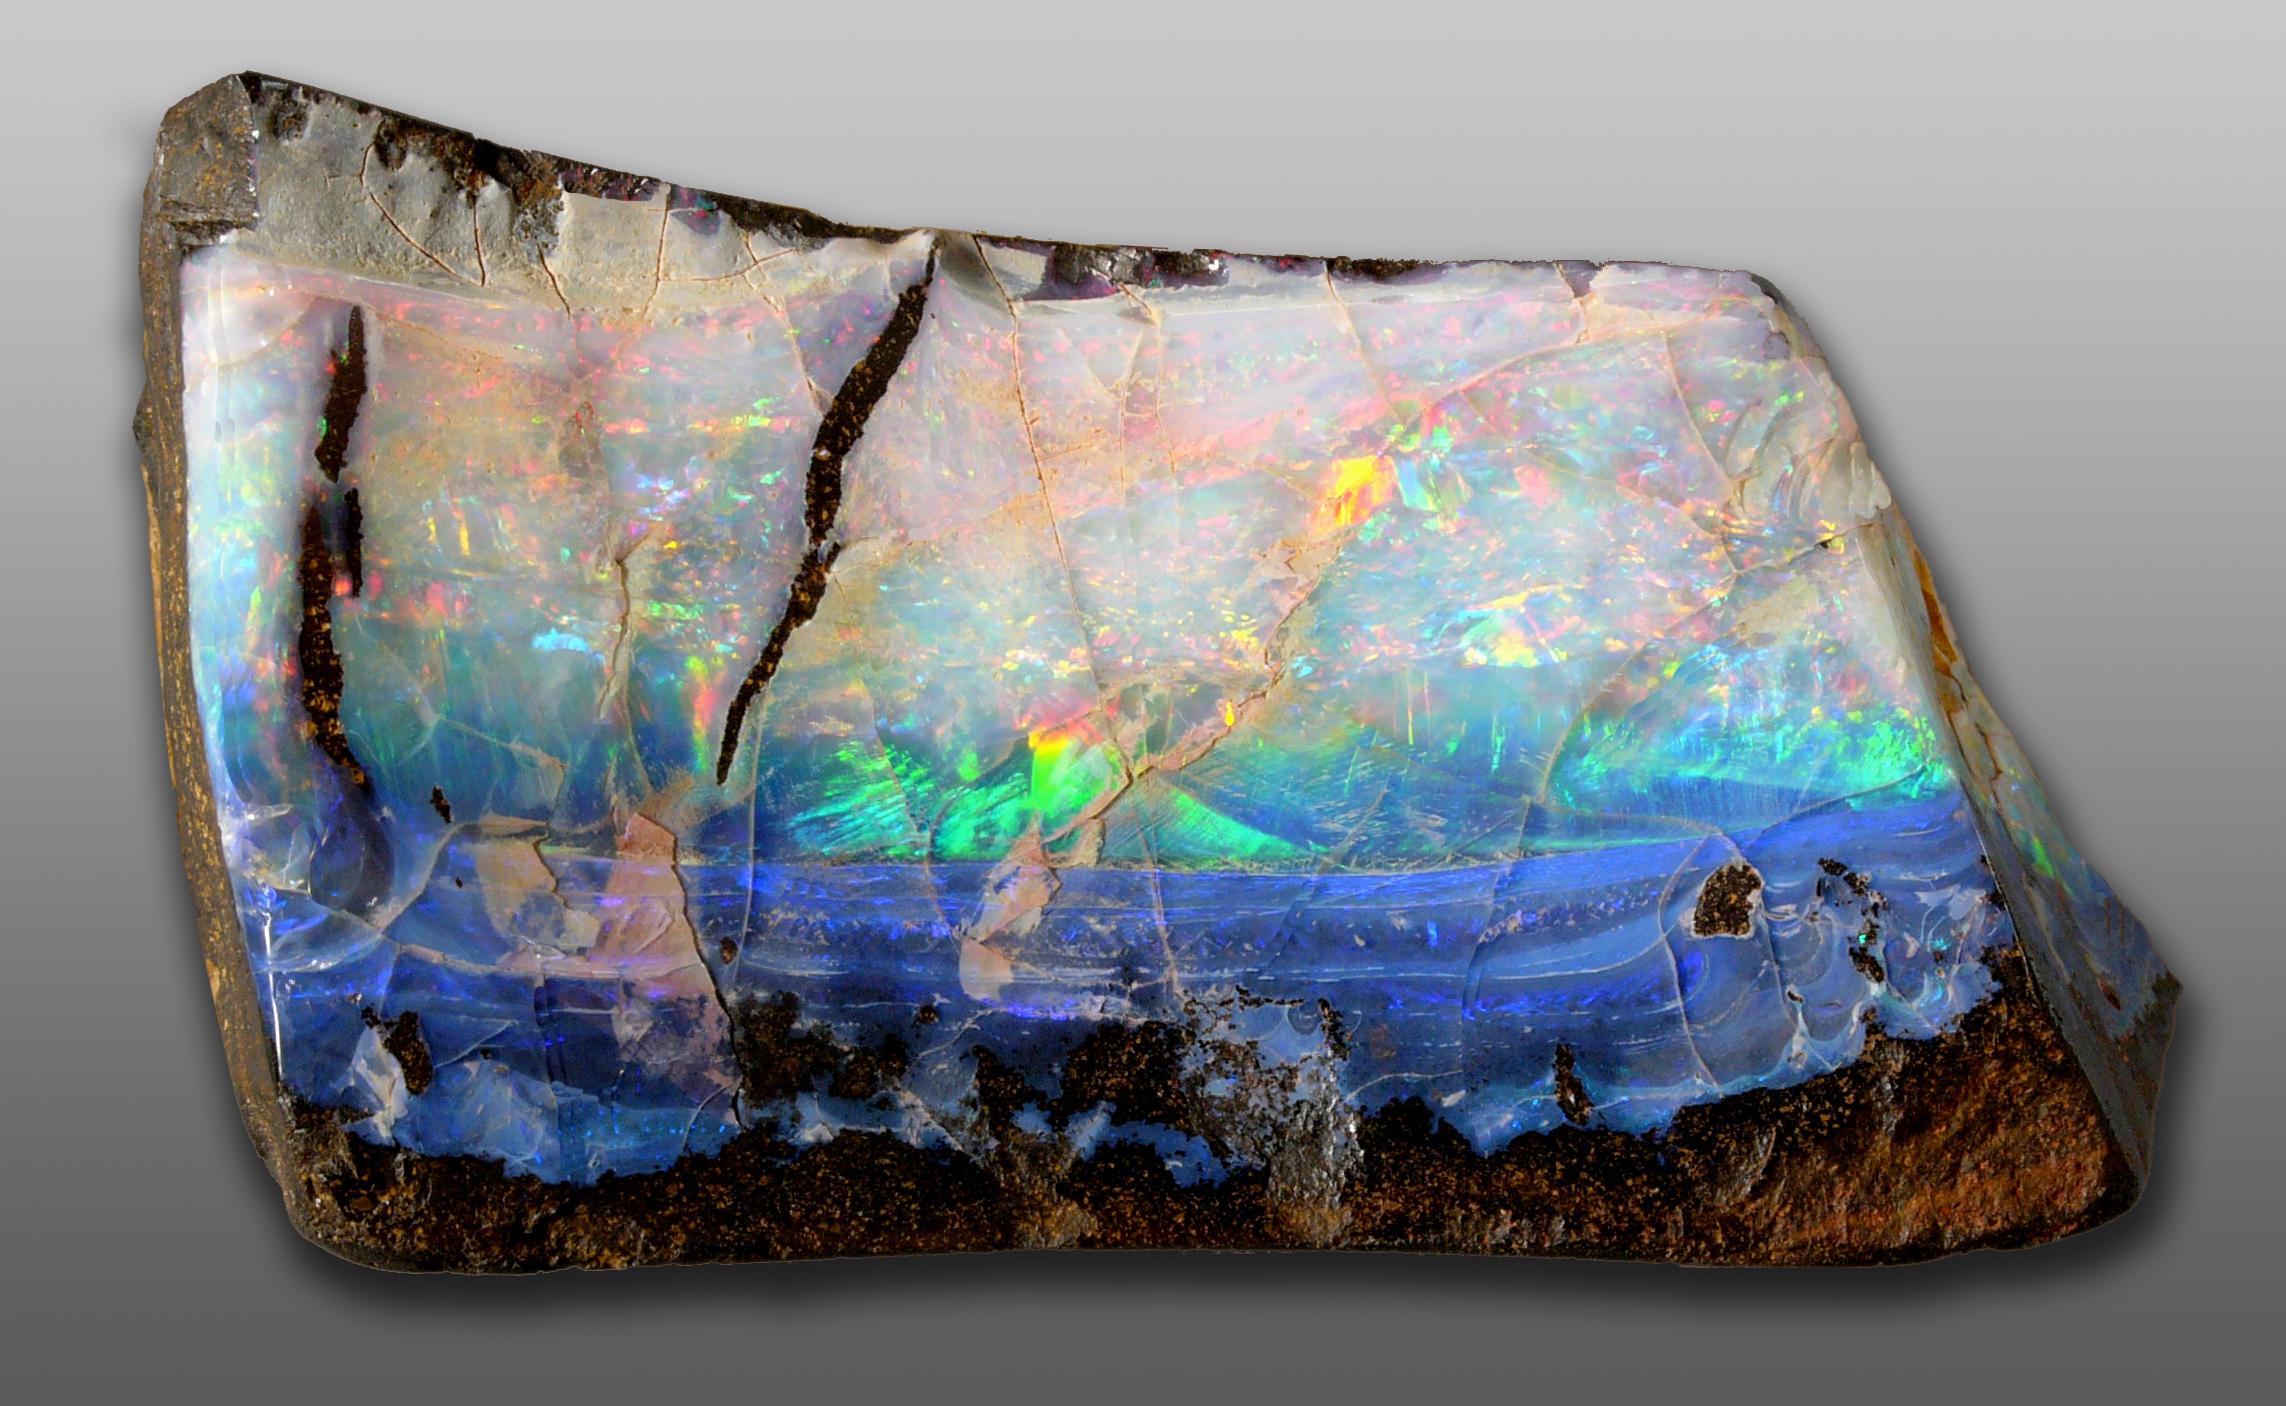 Opal: A Rainbow of Colors